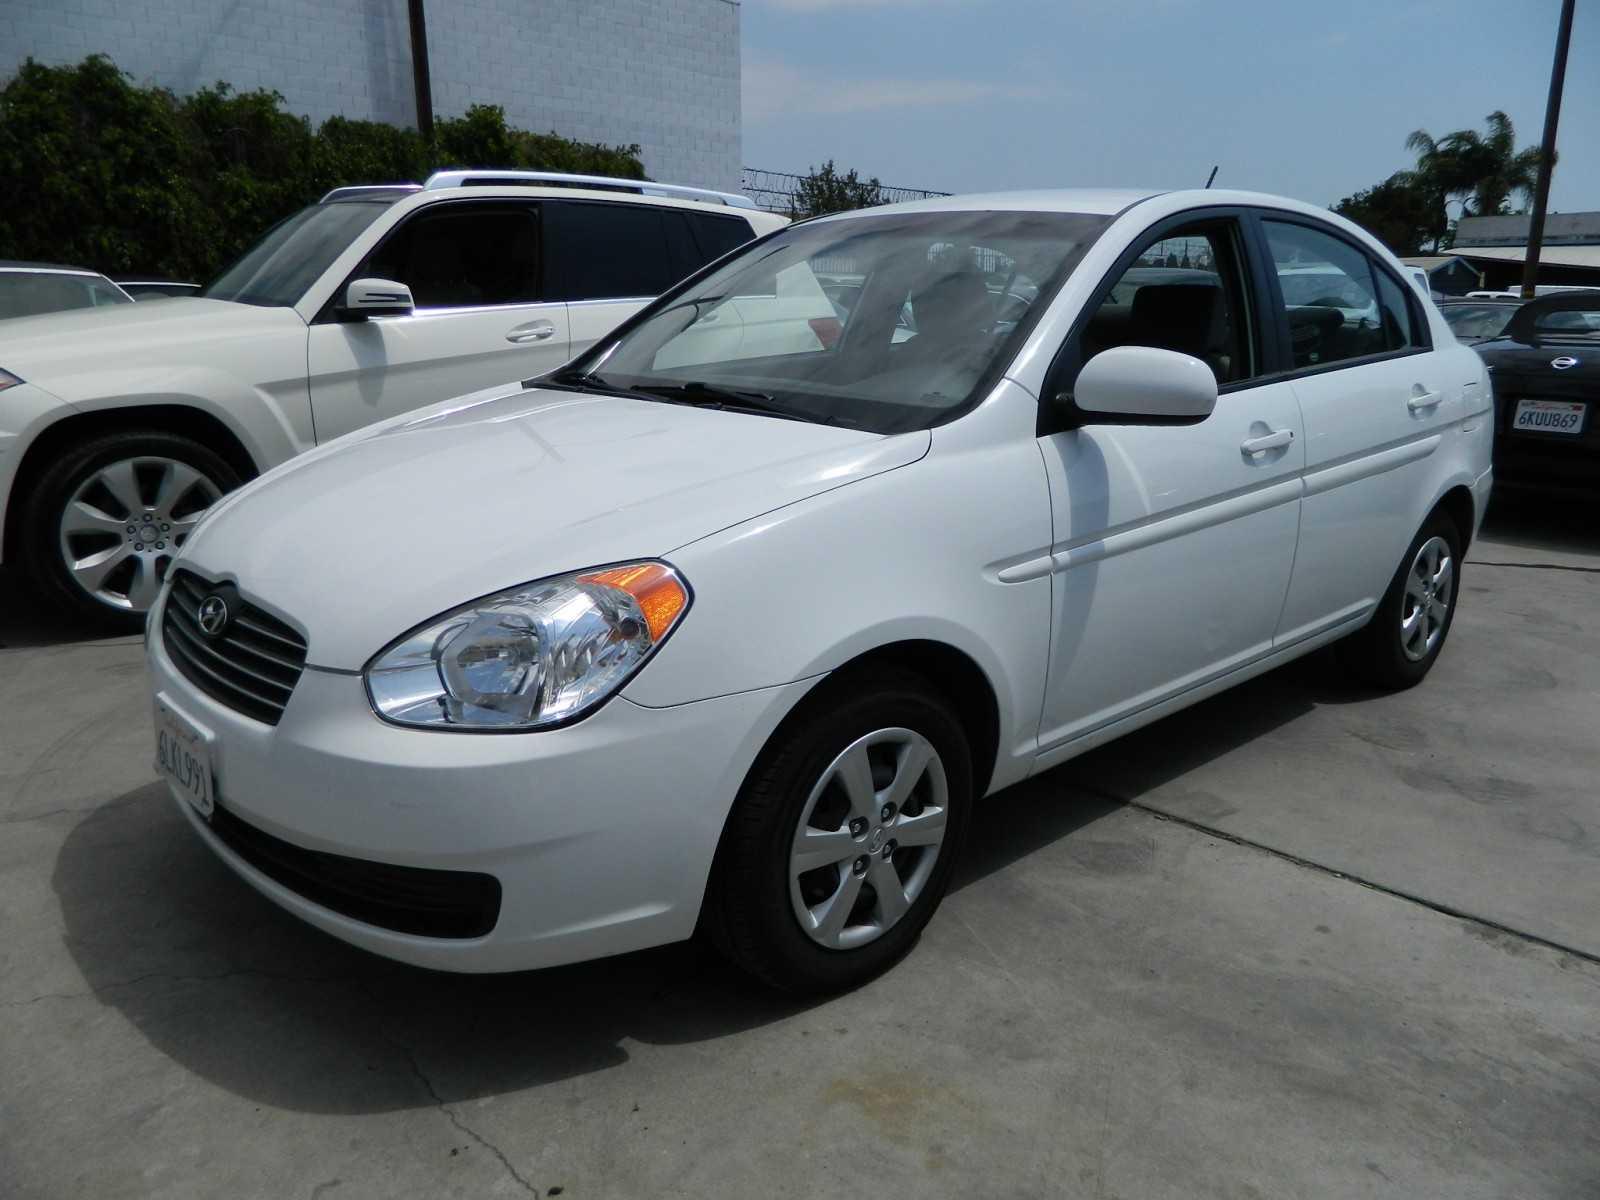 2011 Hyundai Accent Image 15